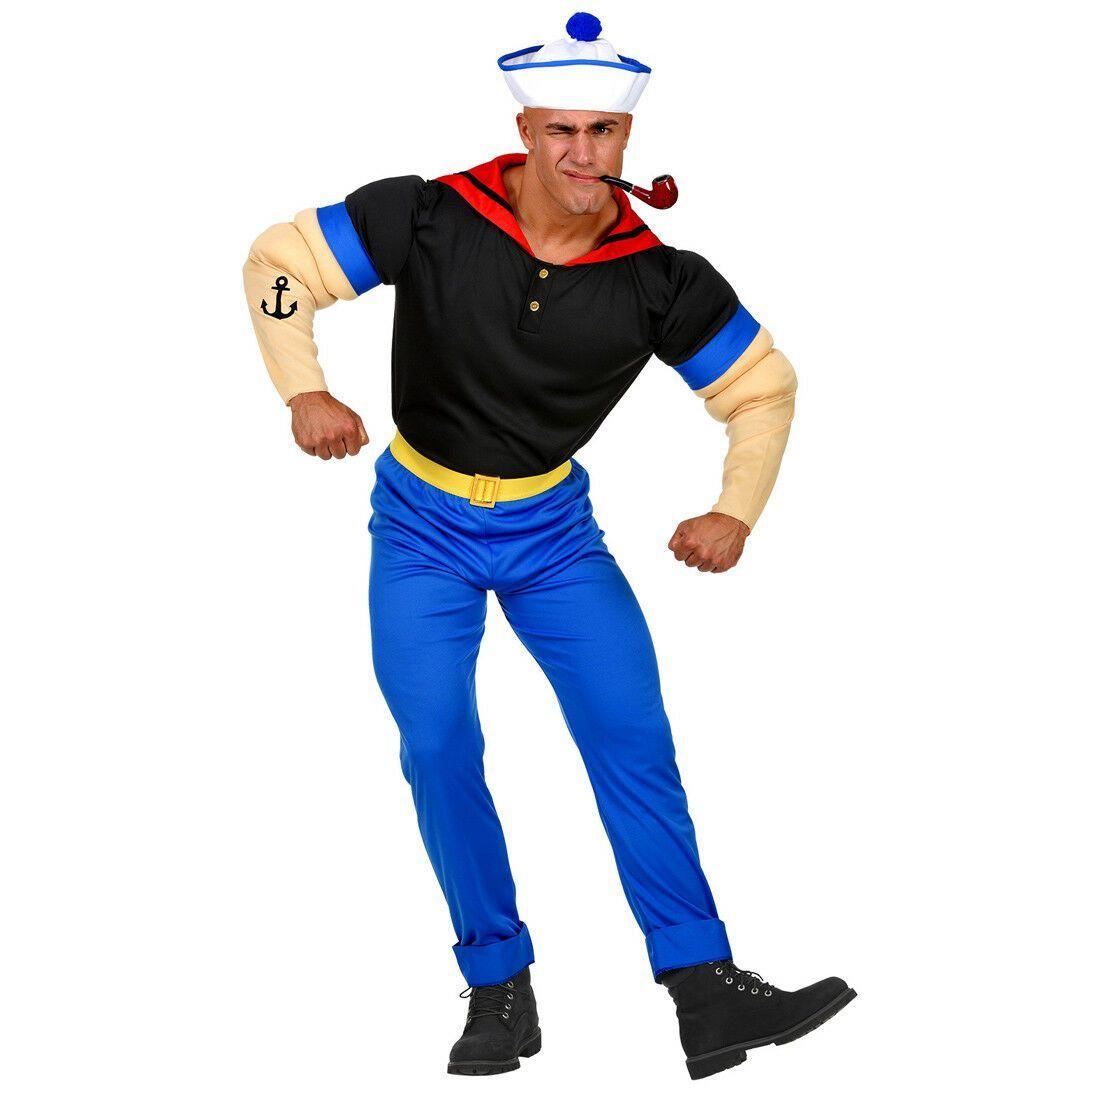 Matrosen Kostüm für Herren Seemann Matrosenkostüm Karneval Seefahrer